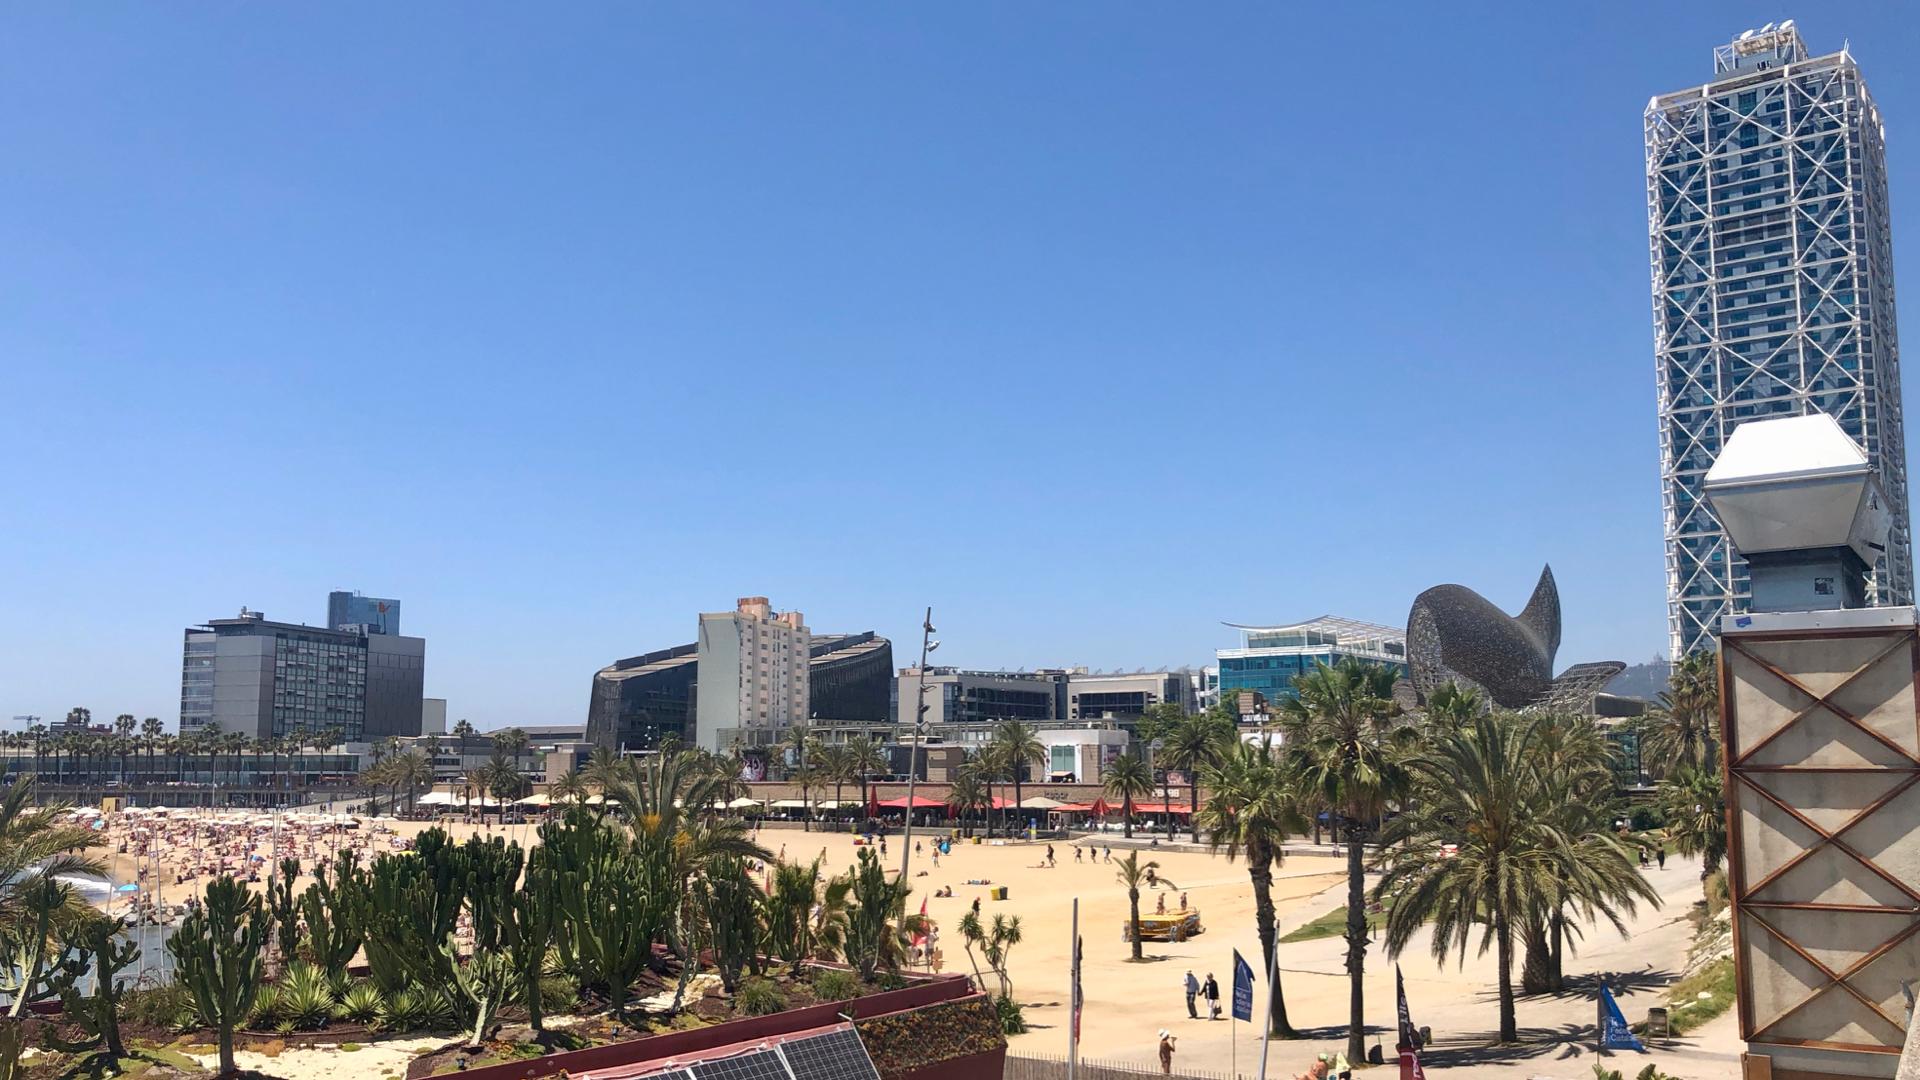 2019 06 Barcelona - 52.jpg